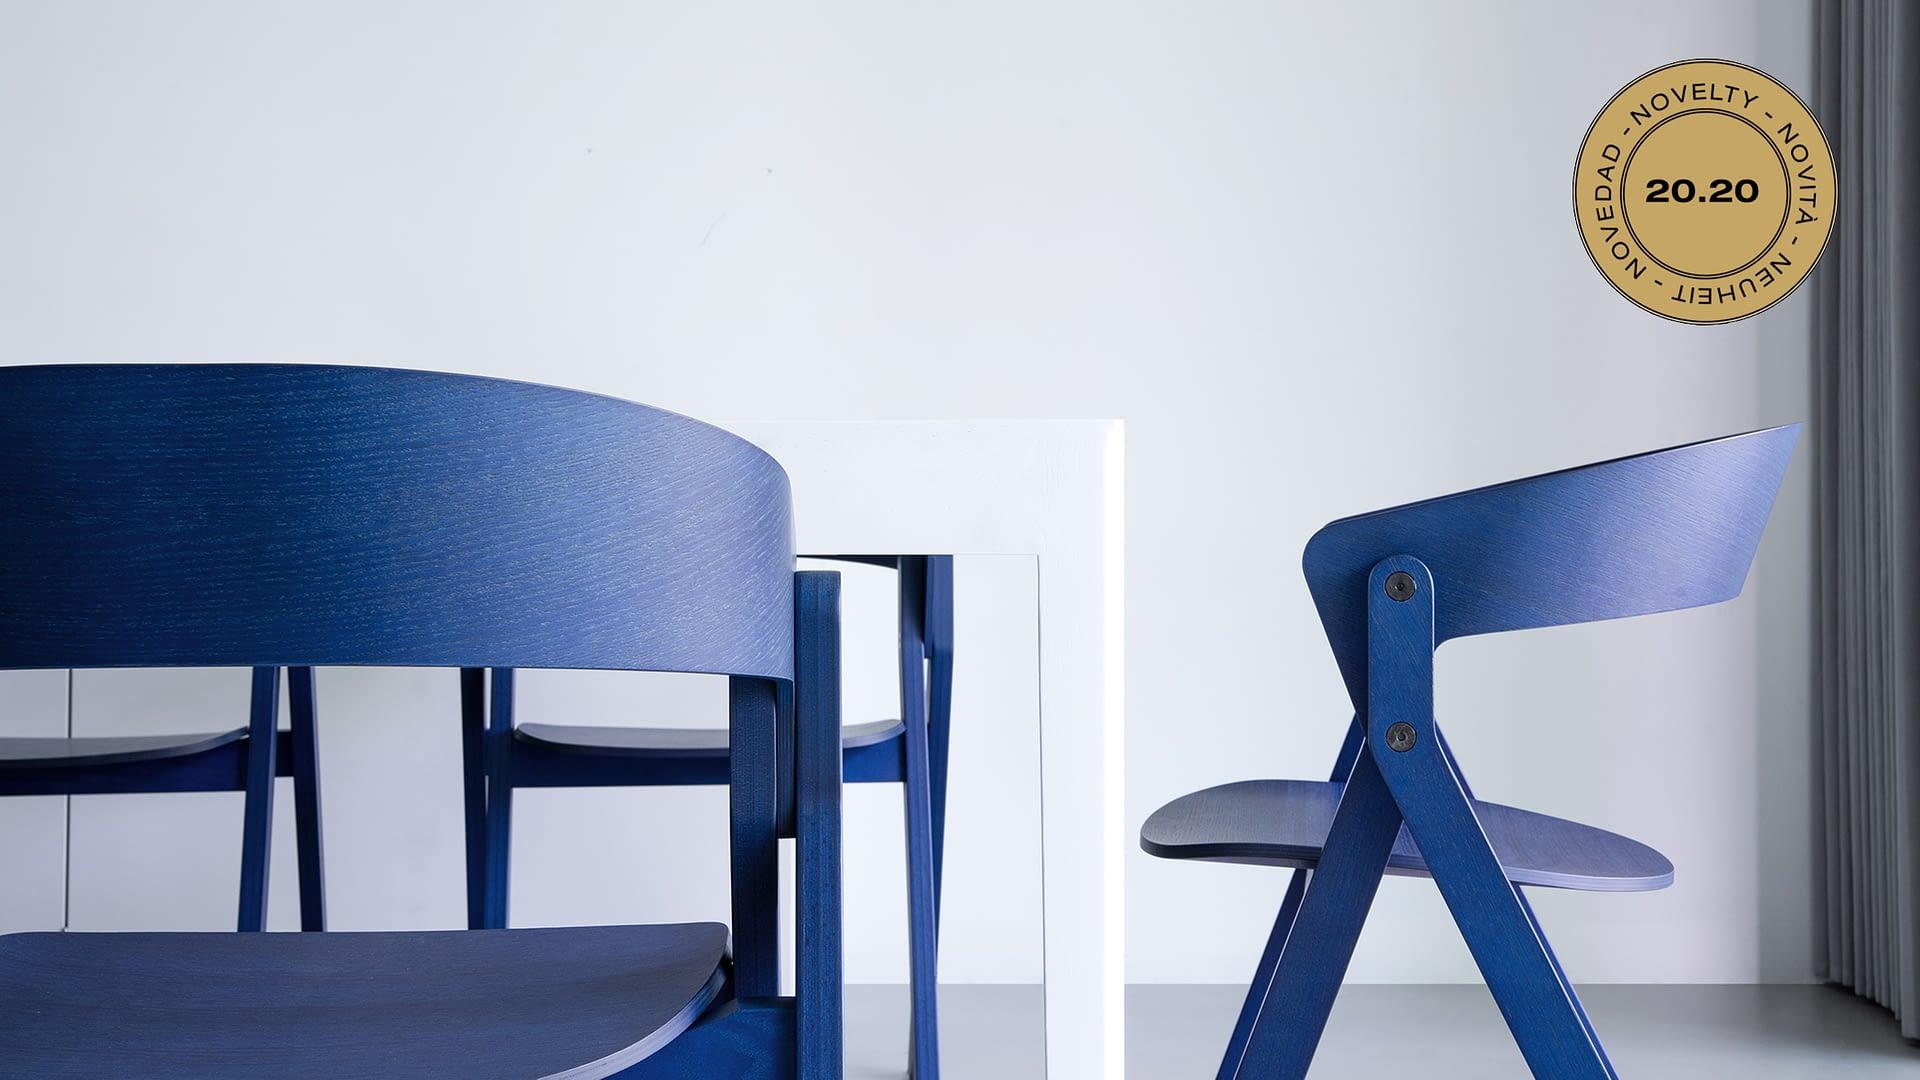 Bedont_20.20_essenza_sapphire blue_1